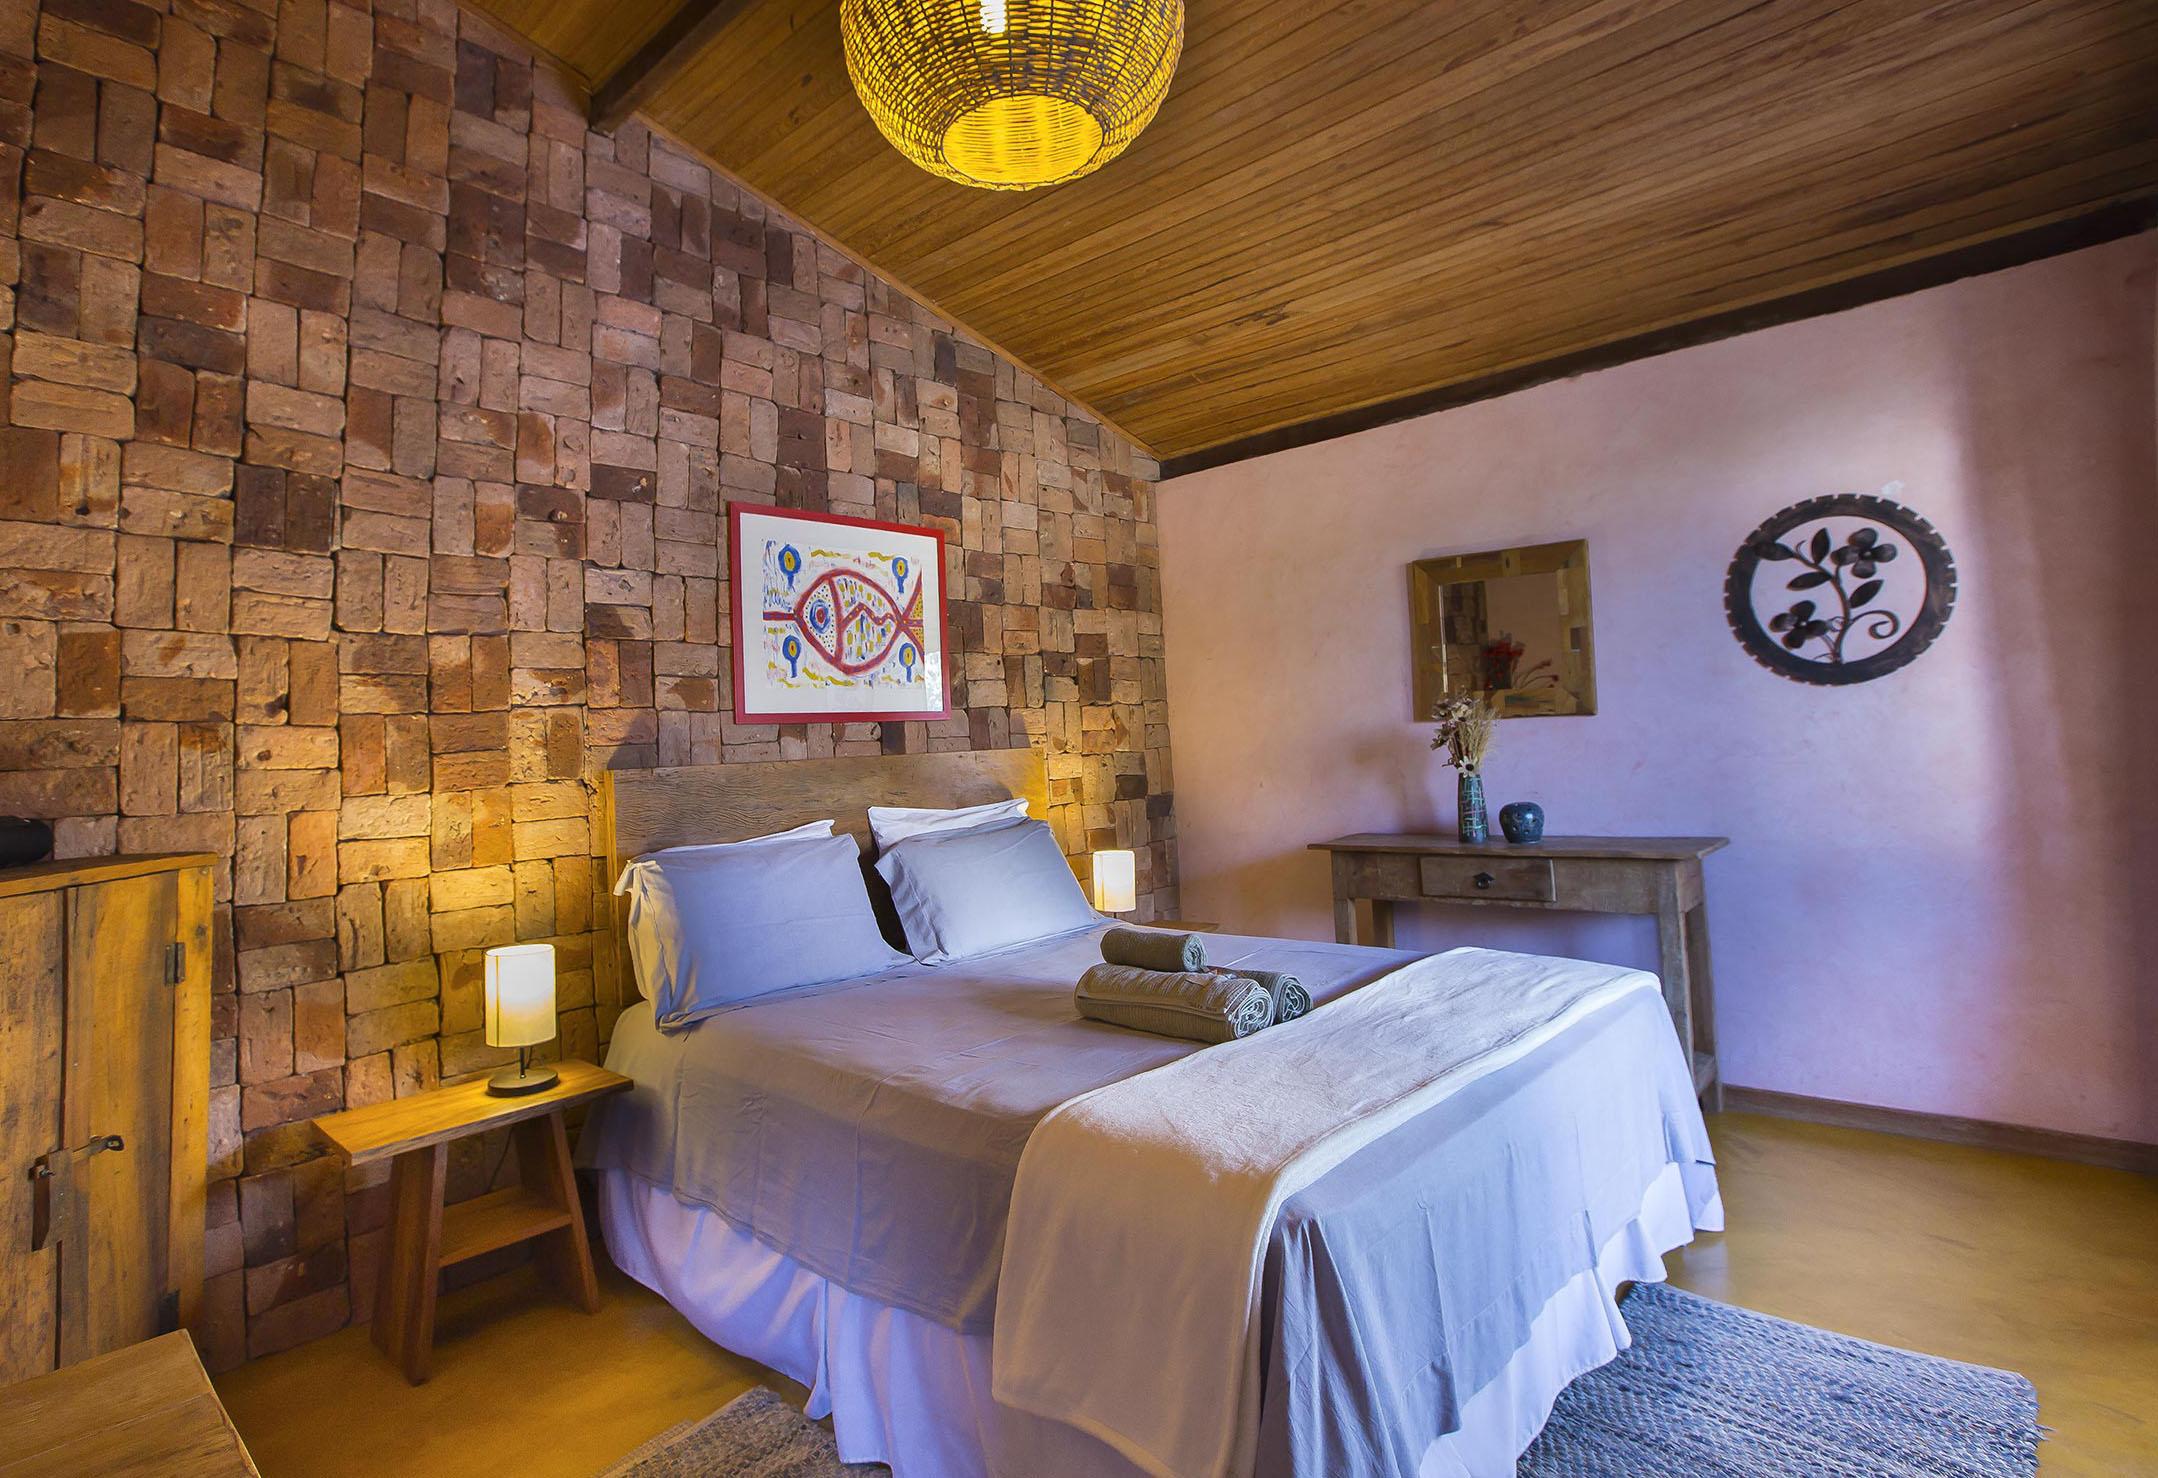 Casa do Teuler - Da Mata Quarto 1 - Lapinha Da Serra MG - Pousada Hotel